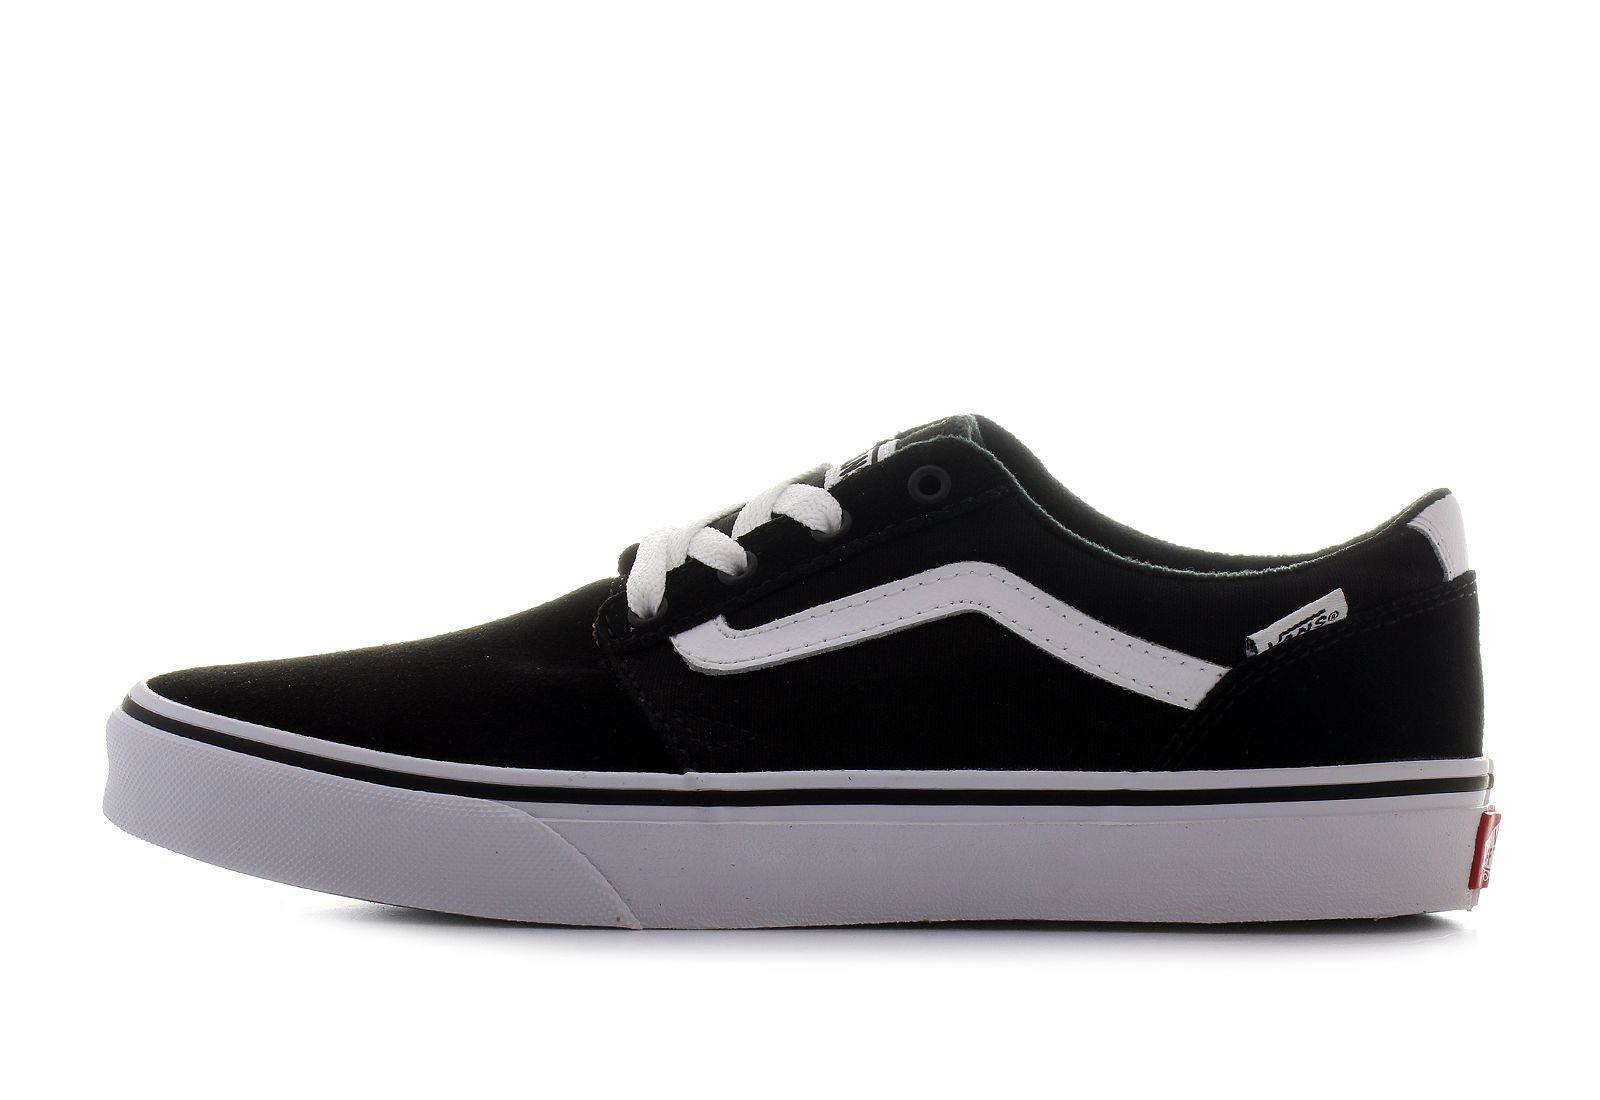 Vans Sneakers - Chapman Stripe - VA349SIJU - Online shop for ... 8453ab1d8a